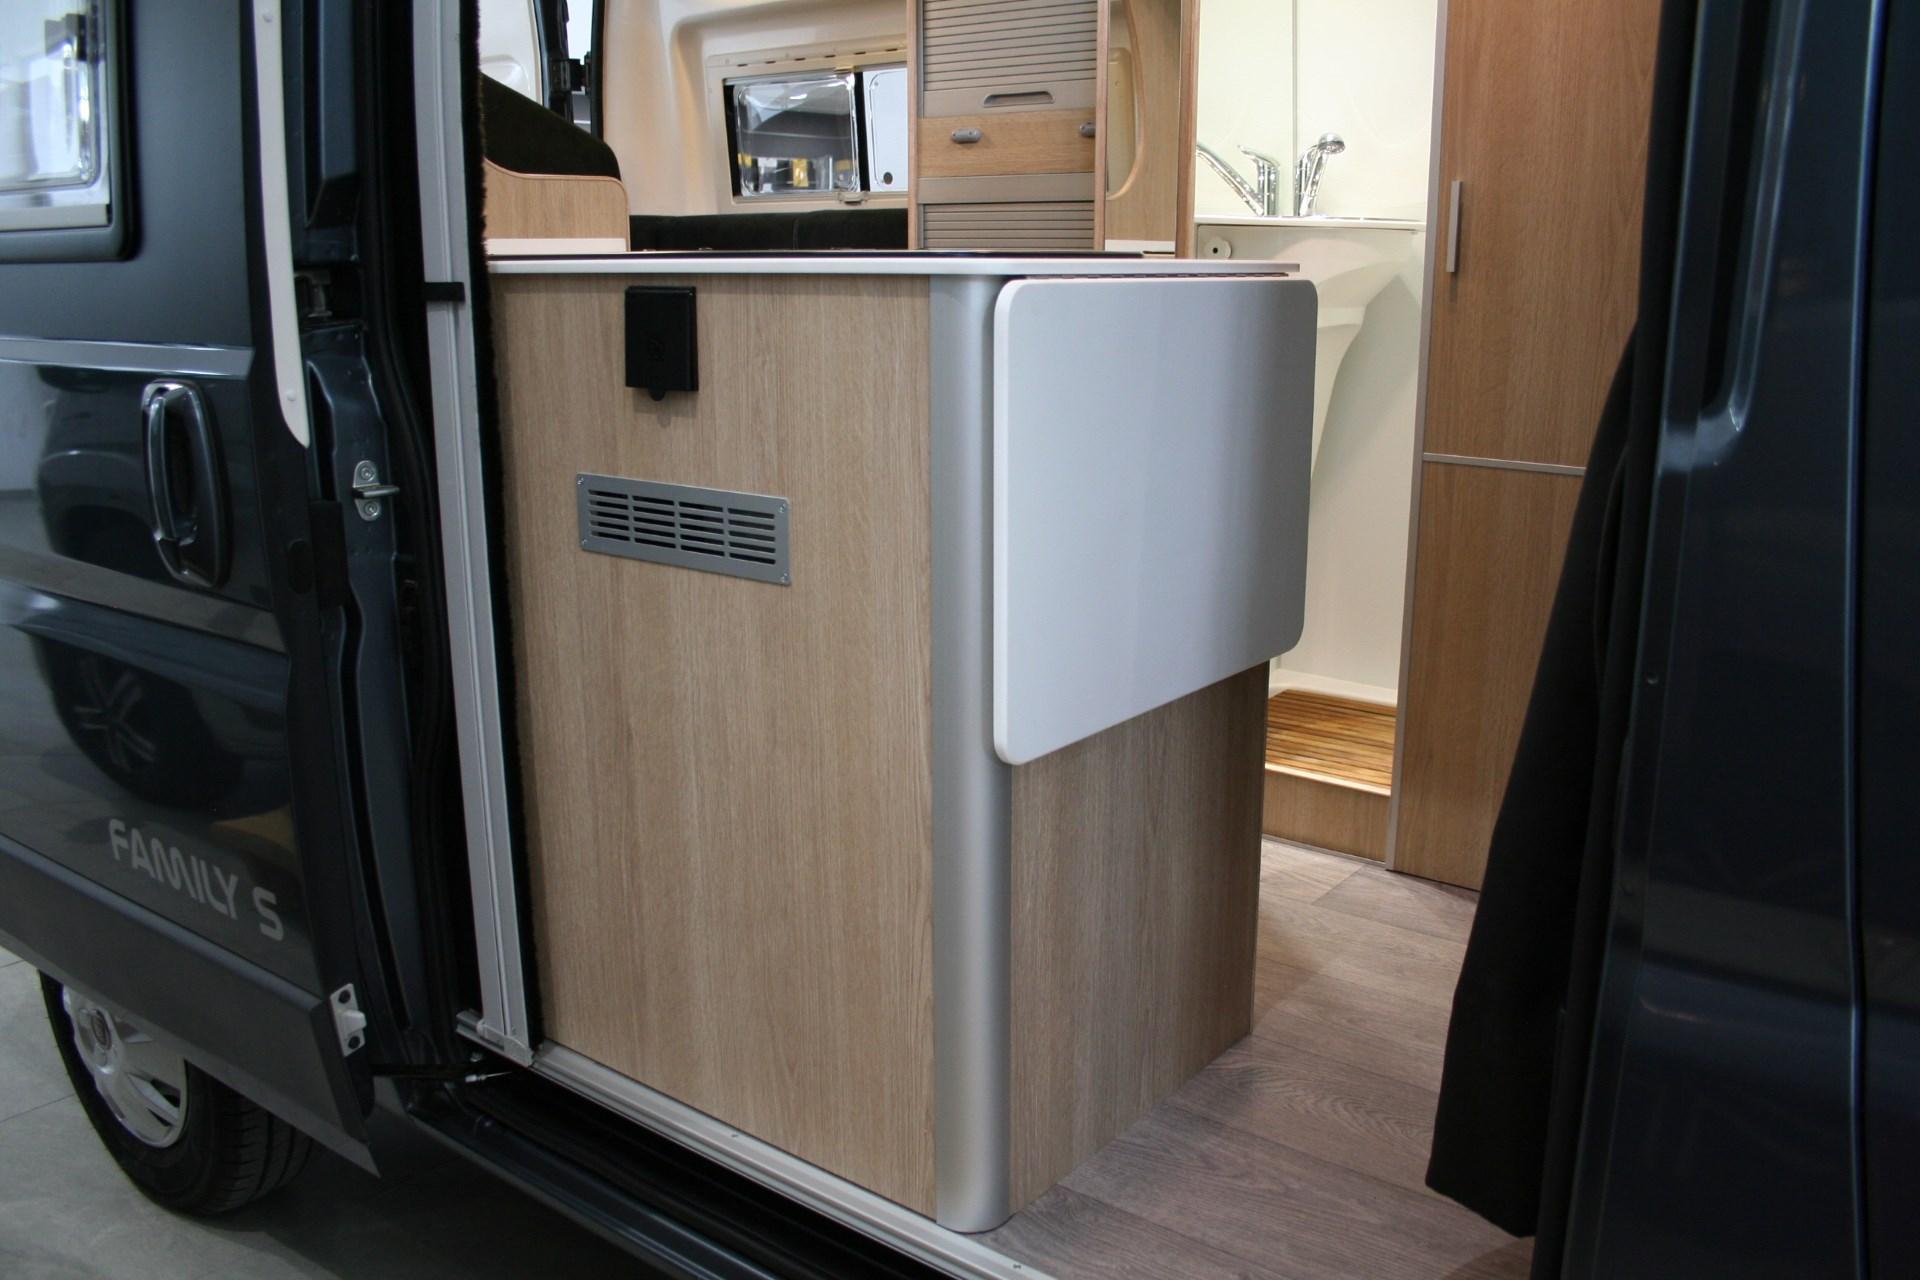 Family S L2H2 Fiat Ducato Bunkervan (8)